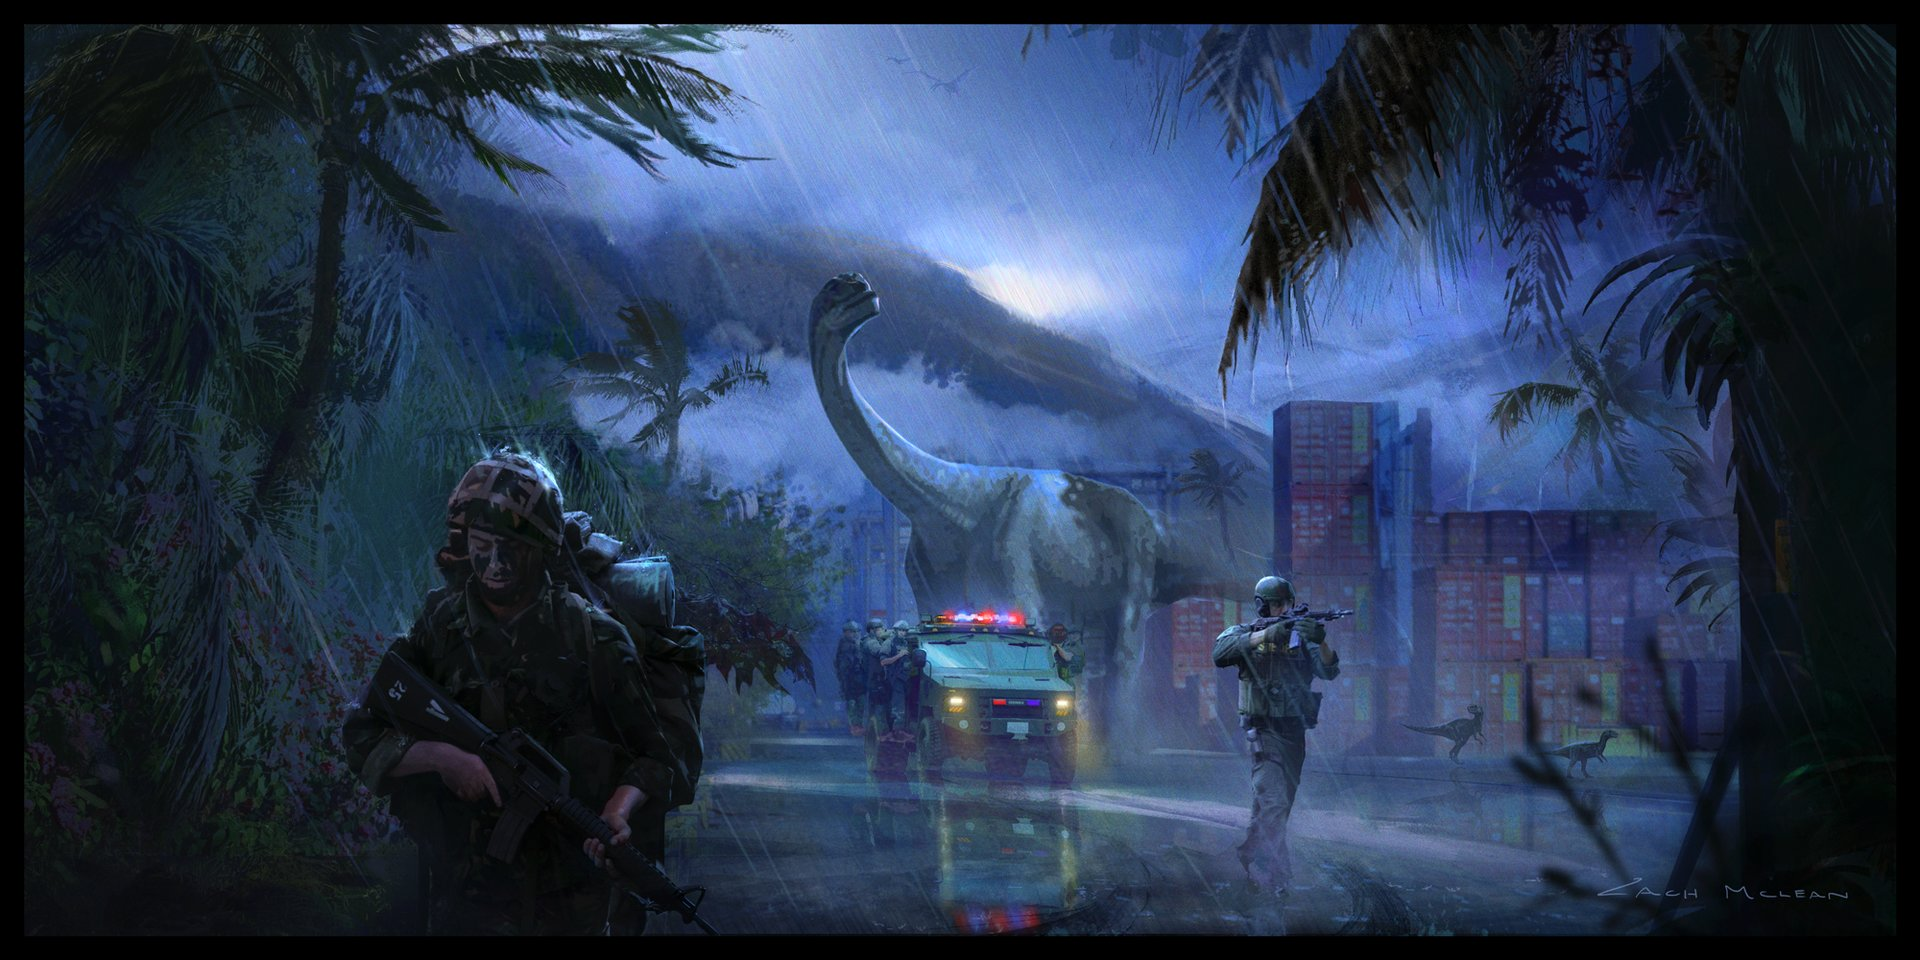 zachary-mclean-dinosaurs-roaming01.jpg